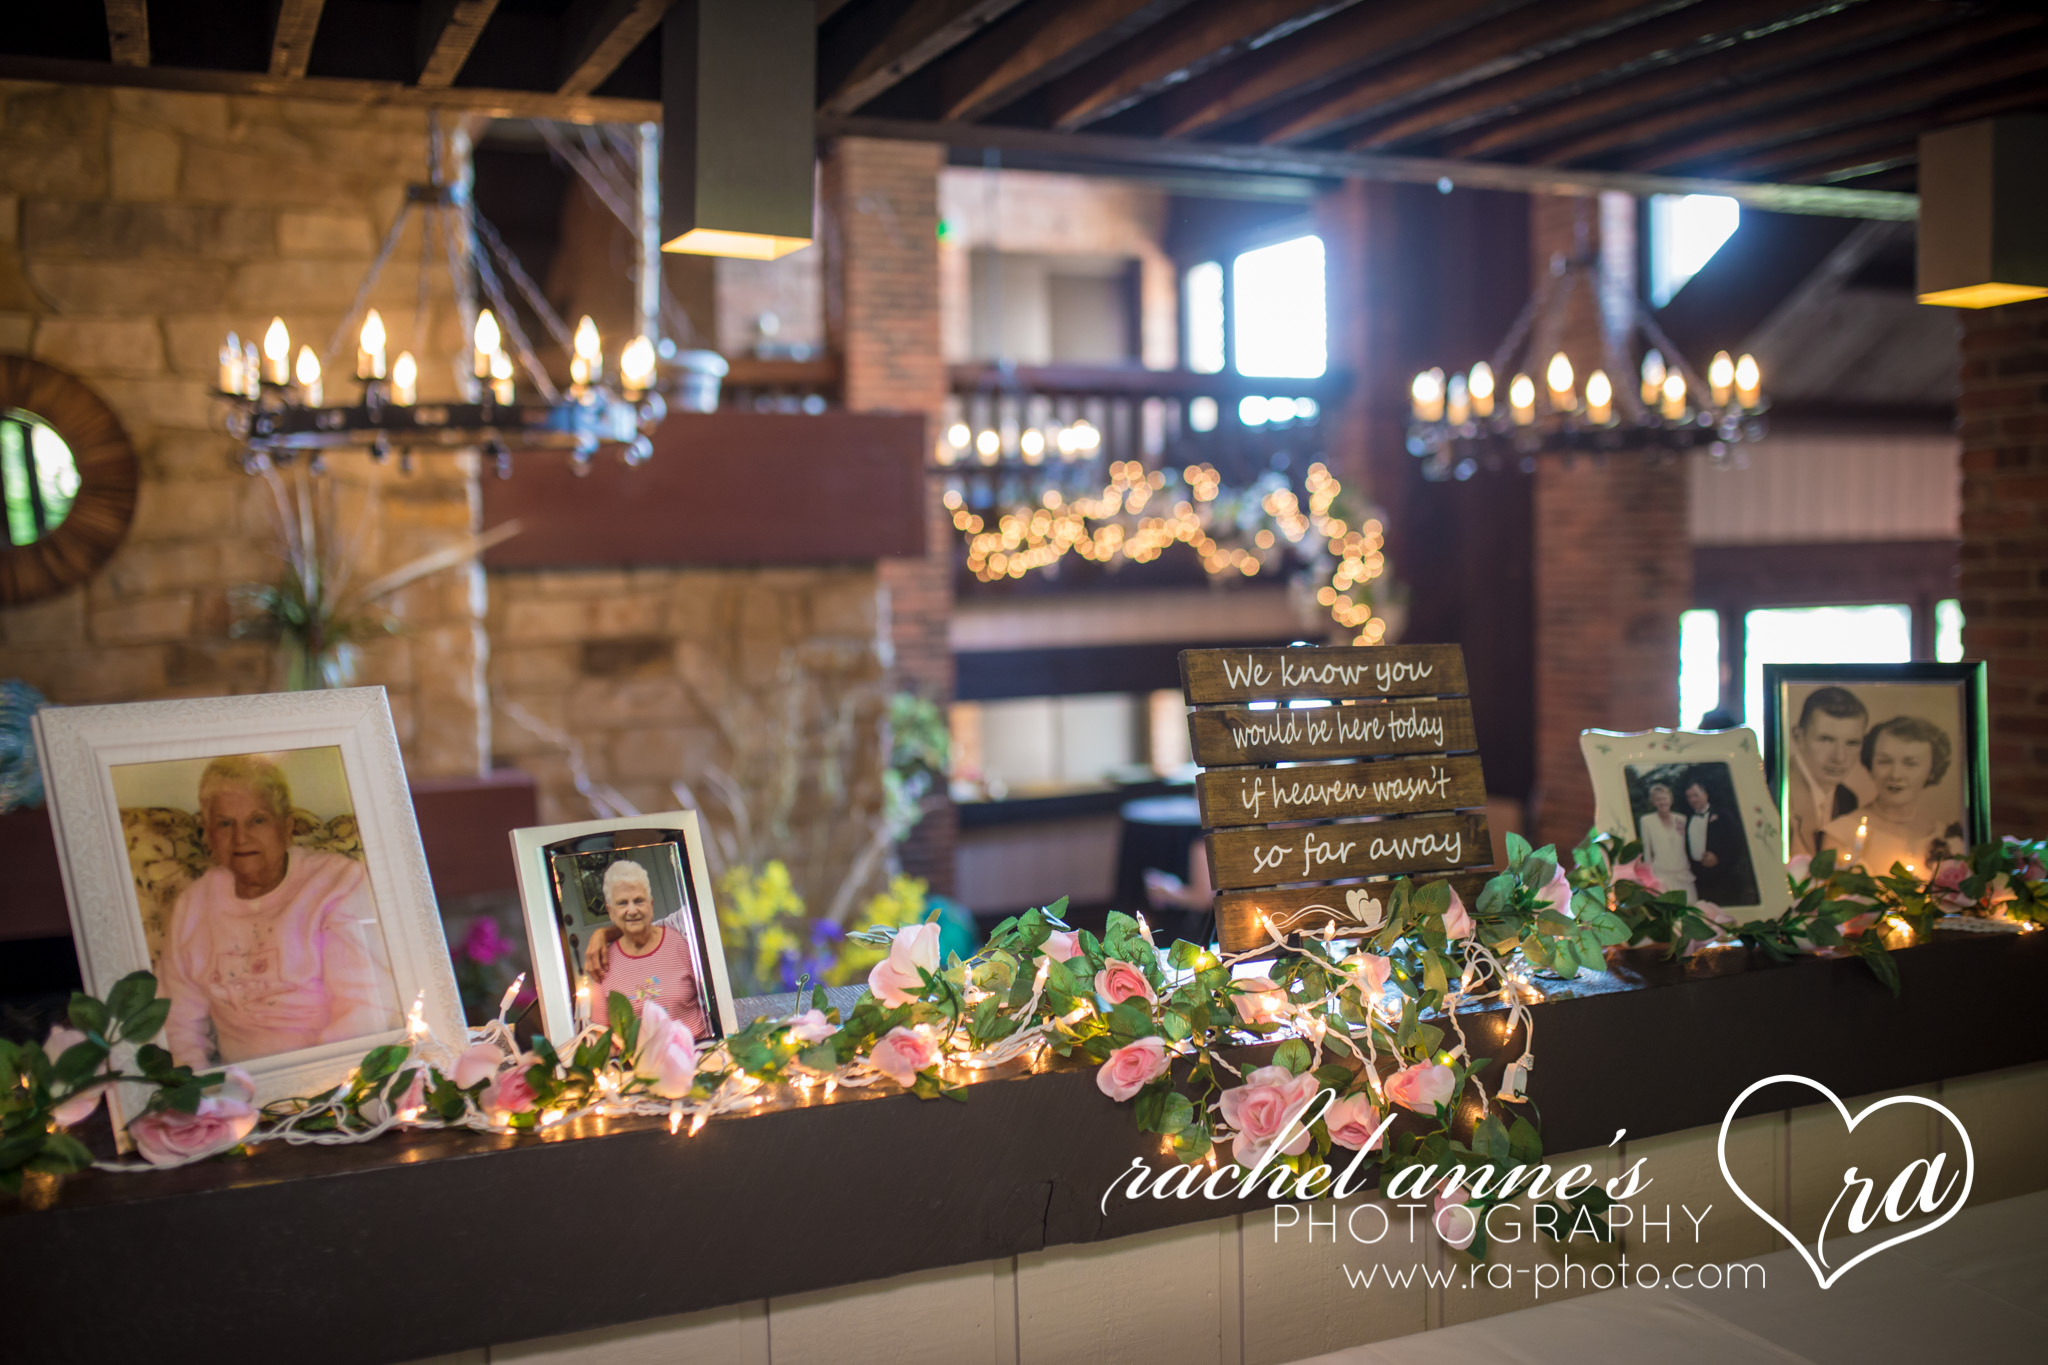 043-CMQ-TREASURE-LAKEVIEW-LODGE-DUBOIS-WEDDINGS.jpg